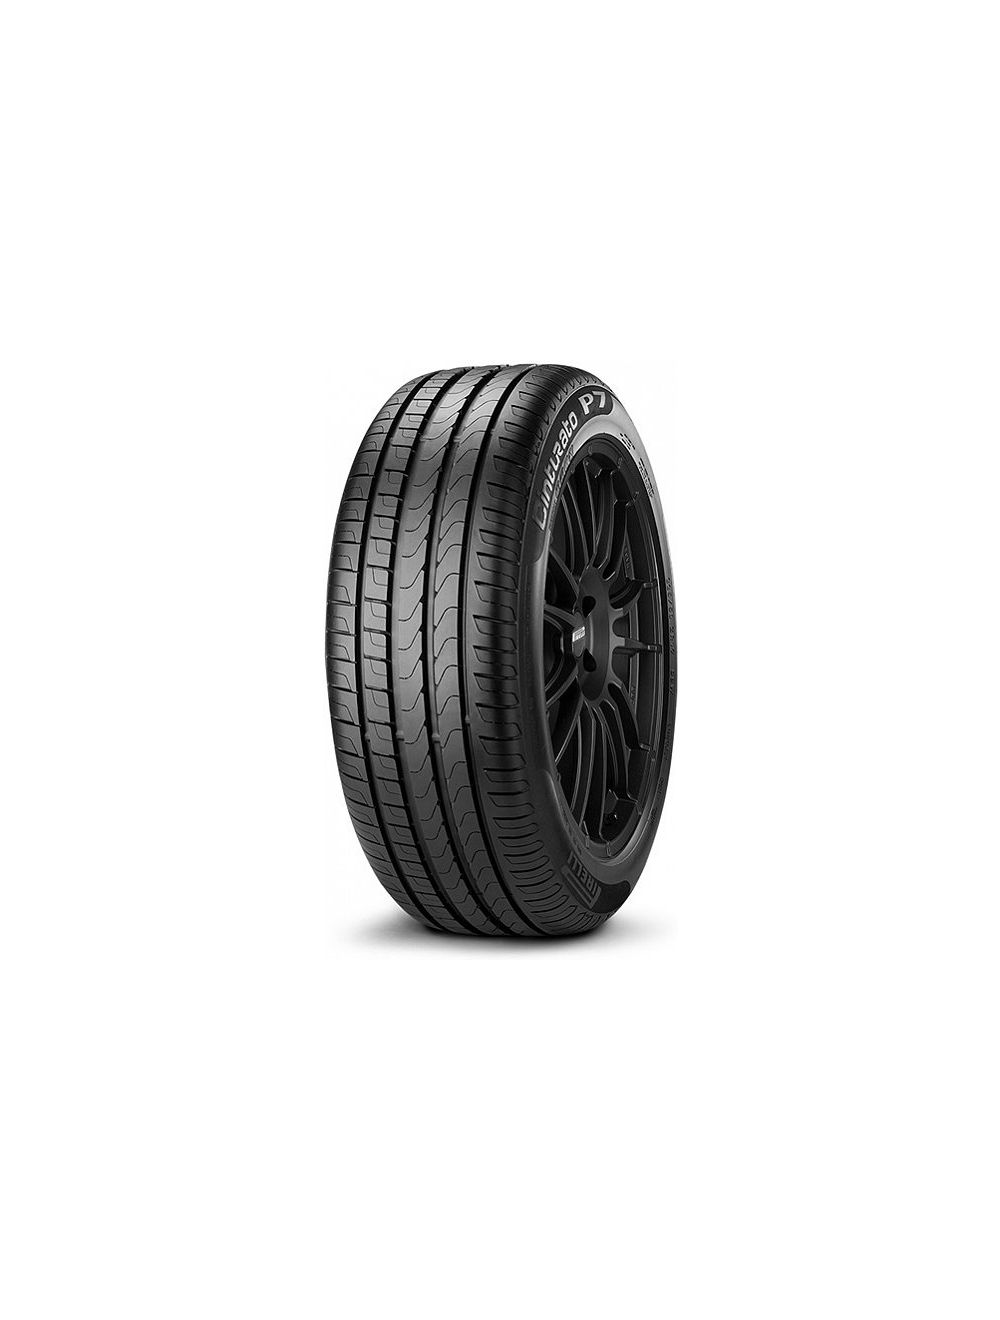 Pirelli 245/50R18 W P7 Cinturato MOE RunFlat Nyári gumi